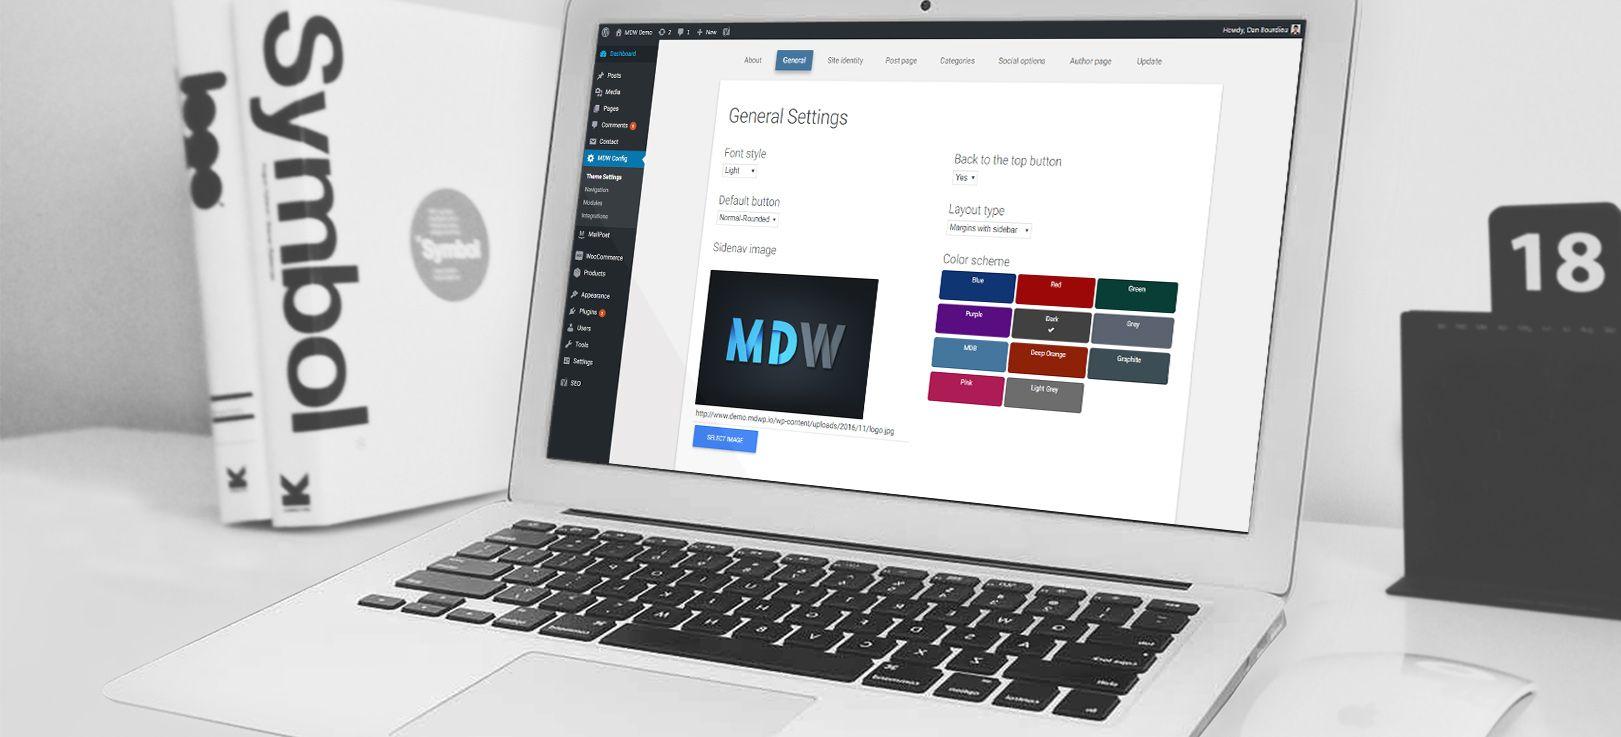 MDW WordPress Tutorial - Config General